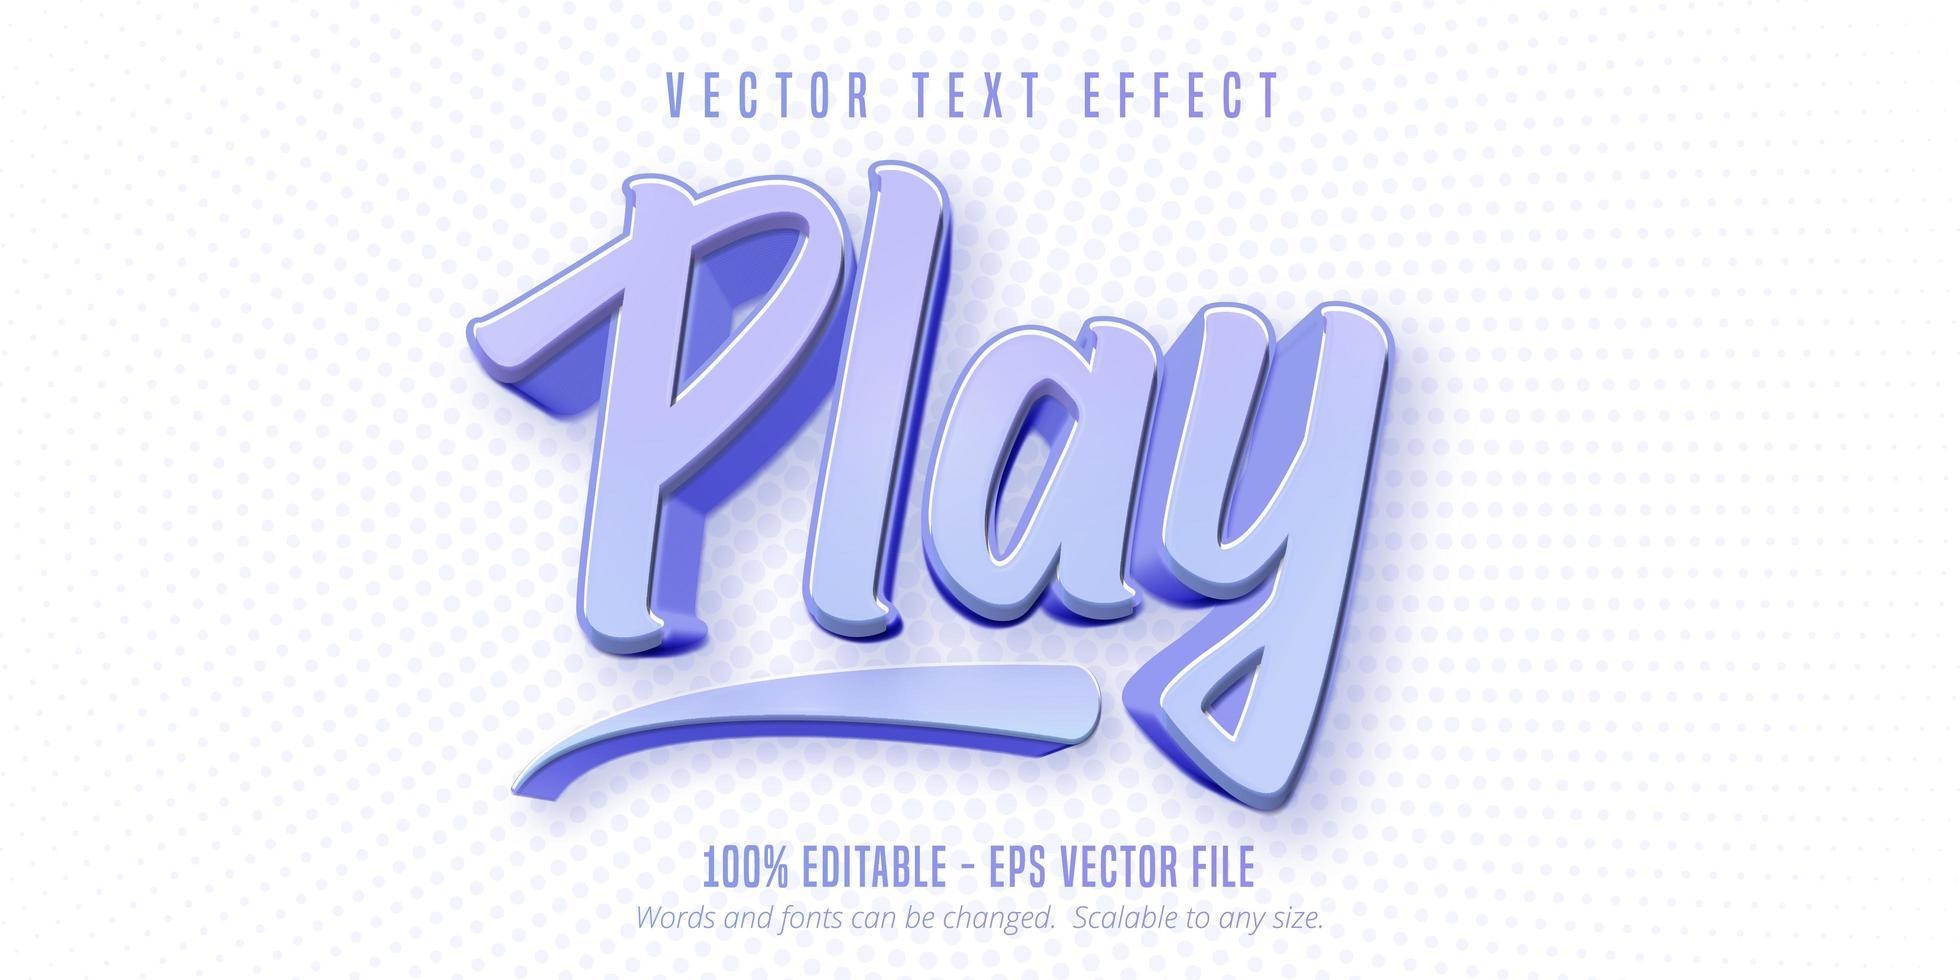 Text spielen, Texteffekt im Spielstil vektor